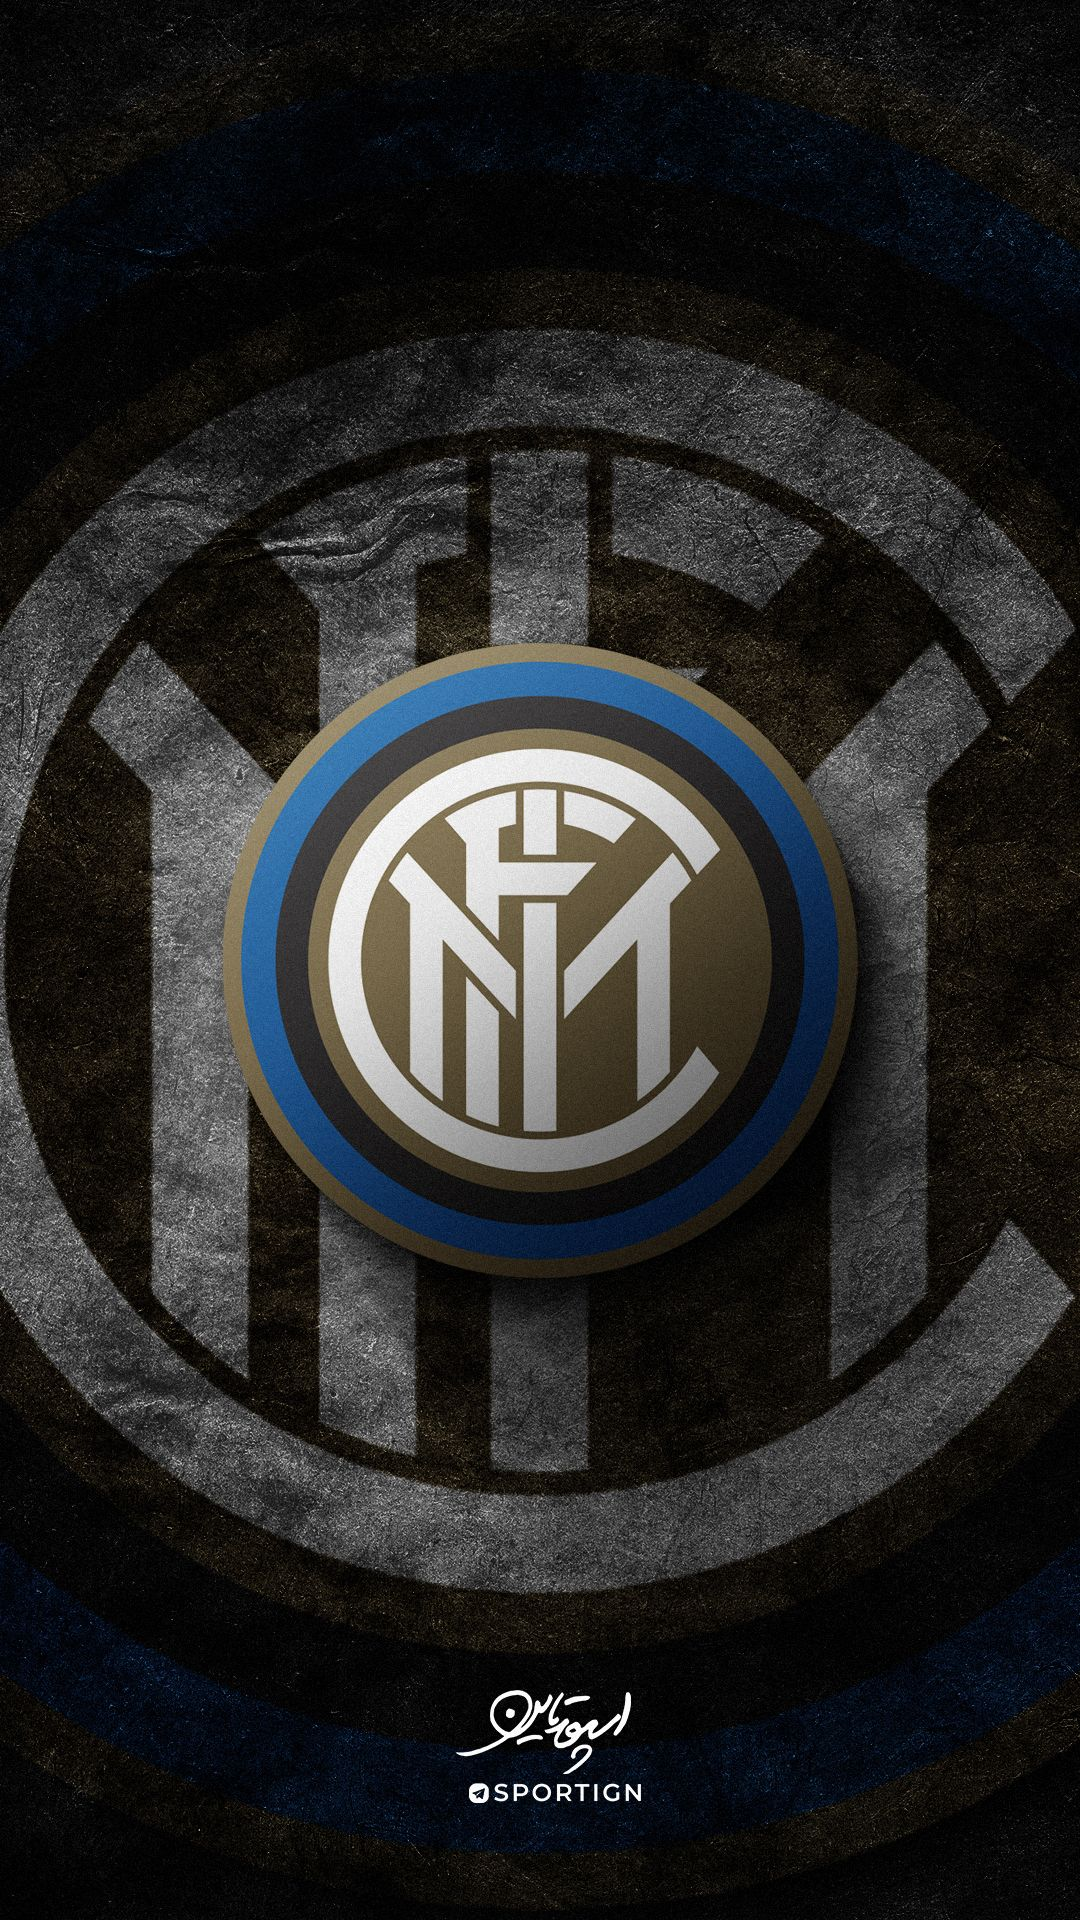 Sports Inter Milan Soccer Club Футбол, Спорт и Фоновые